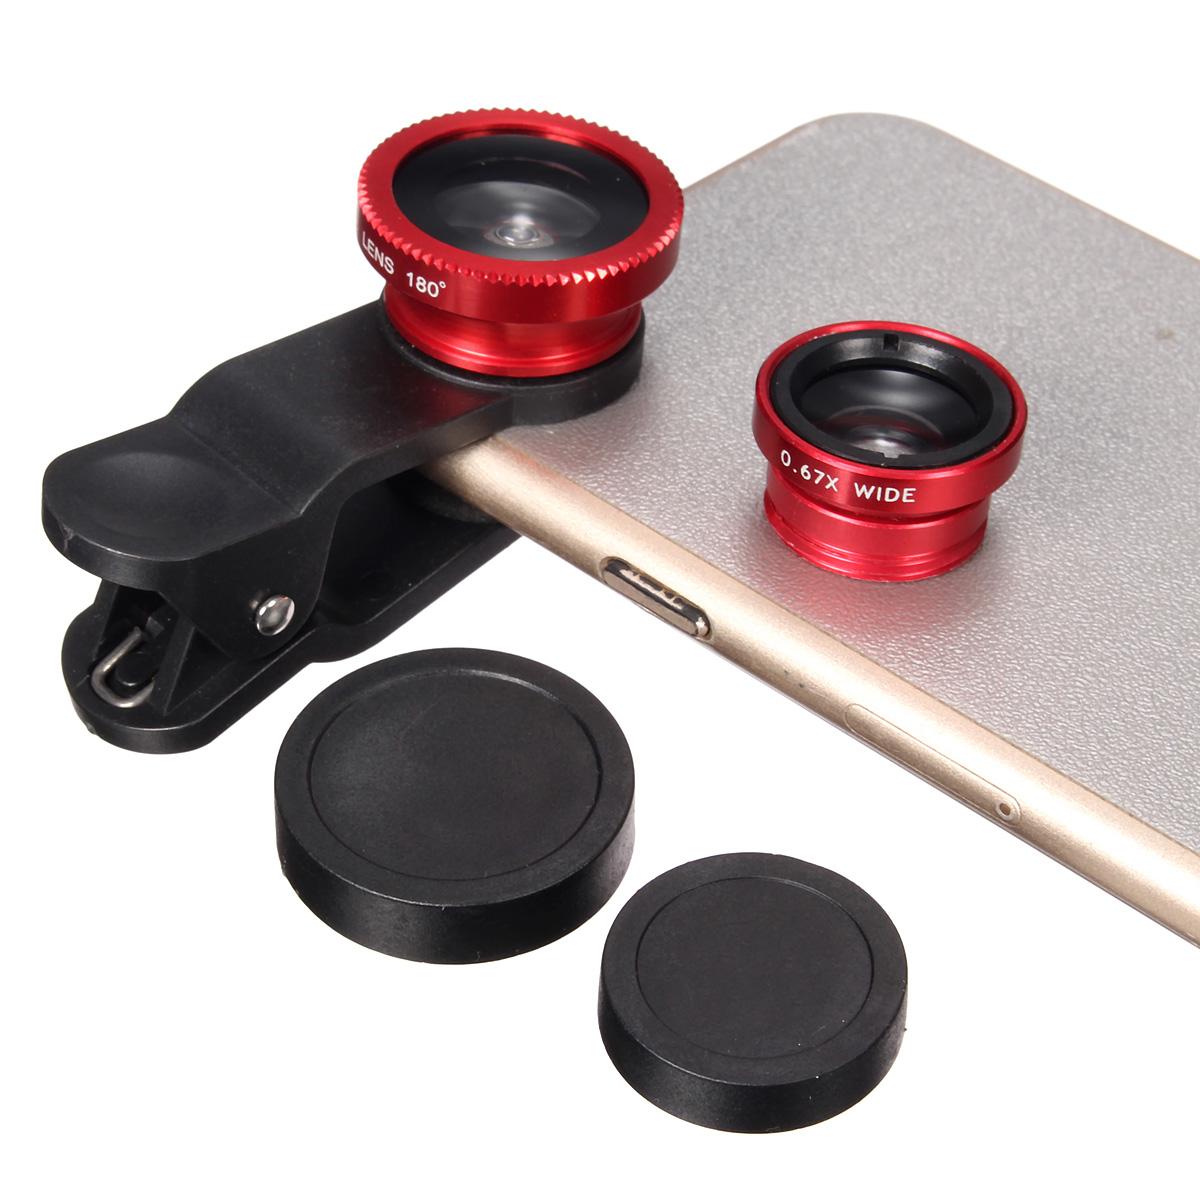 3 in 1 fish eye macro wide angle universal mobile for Fish eye lens